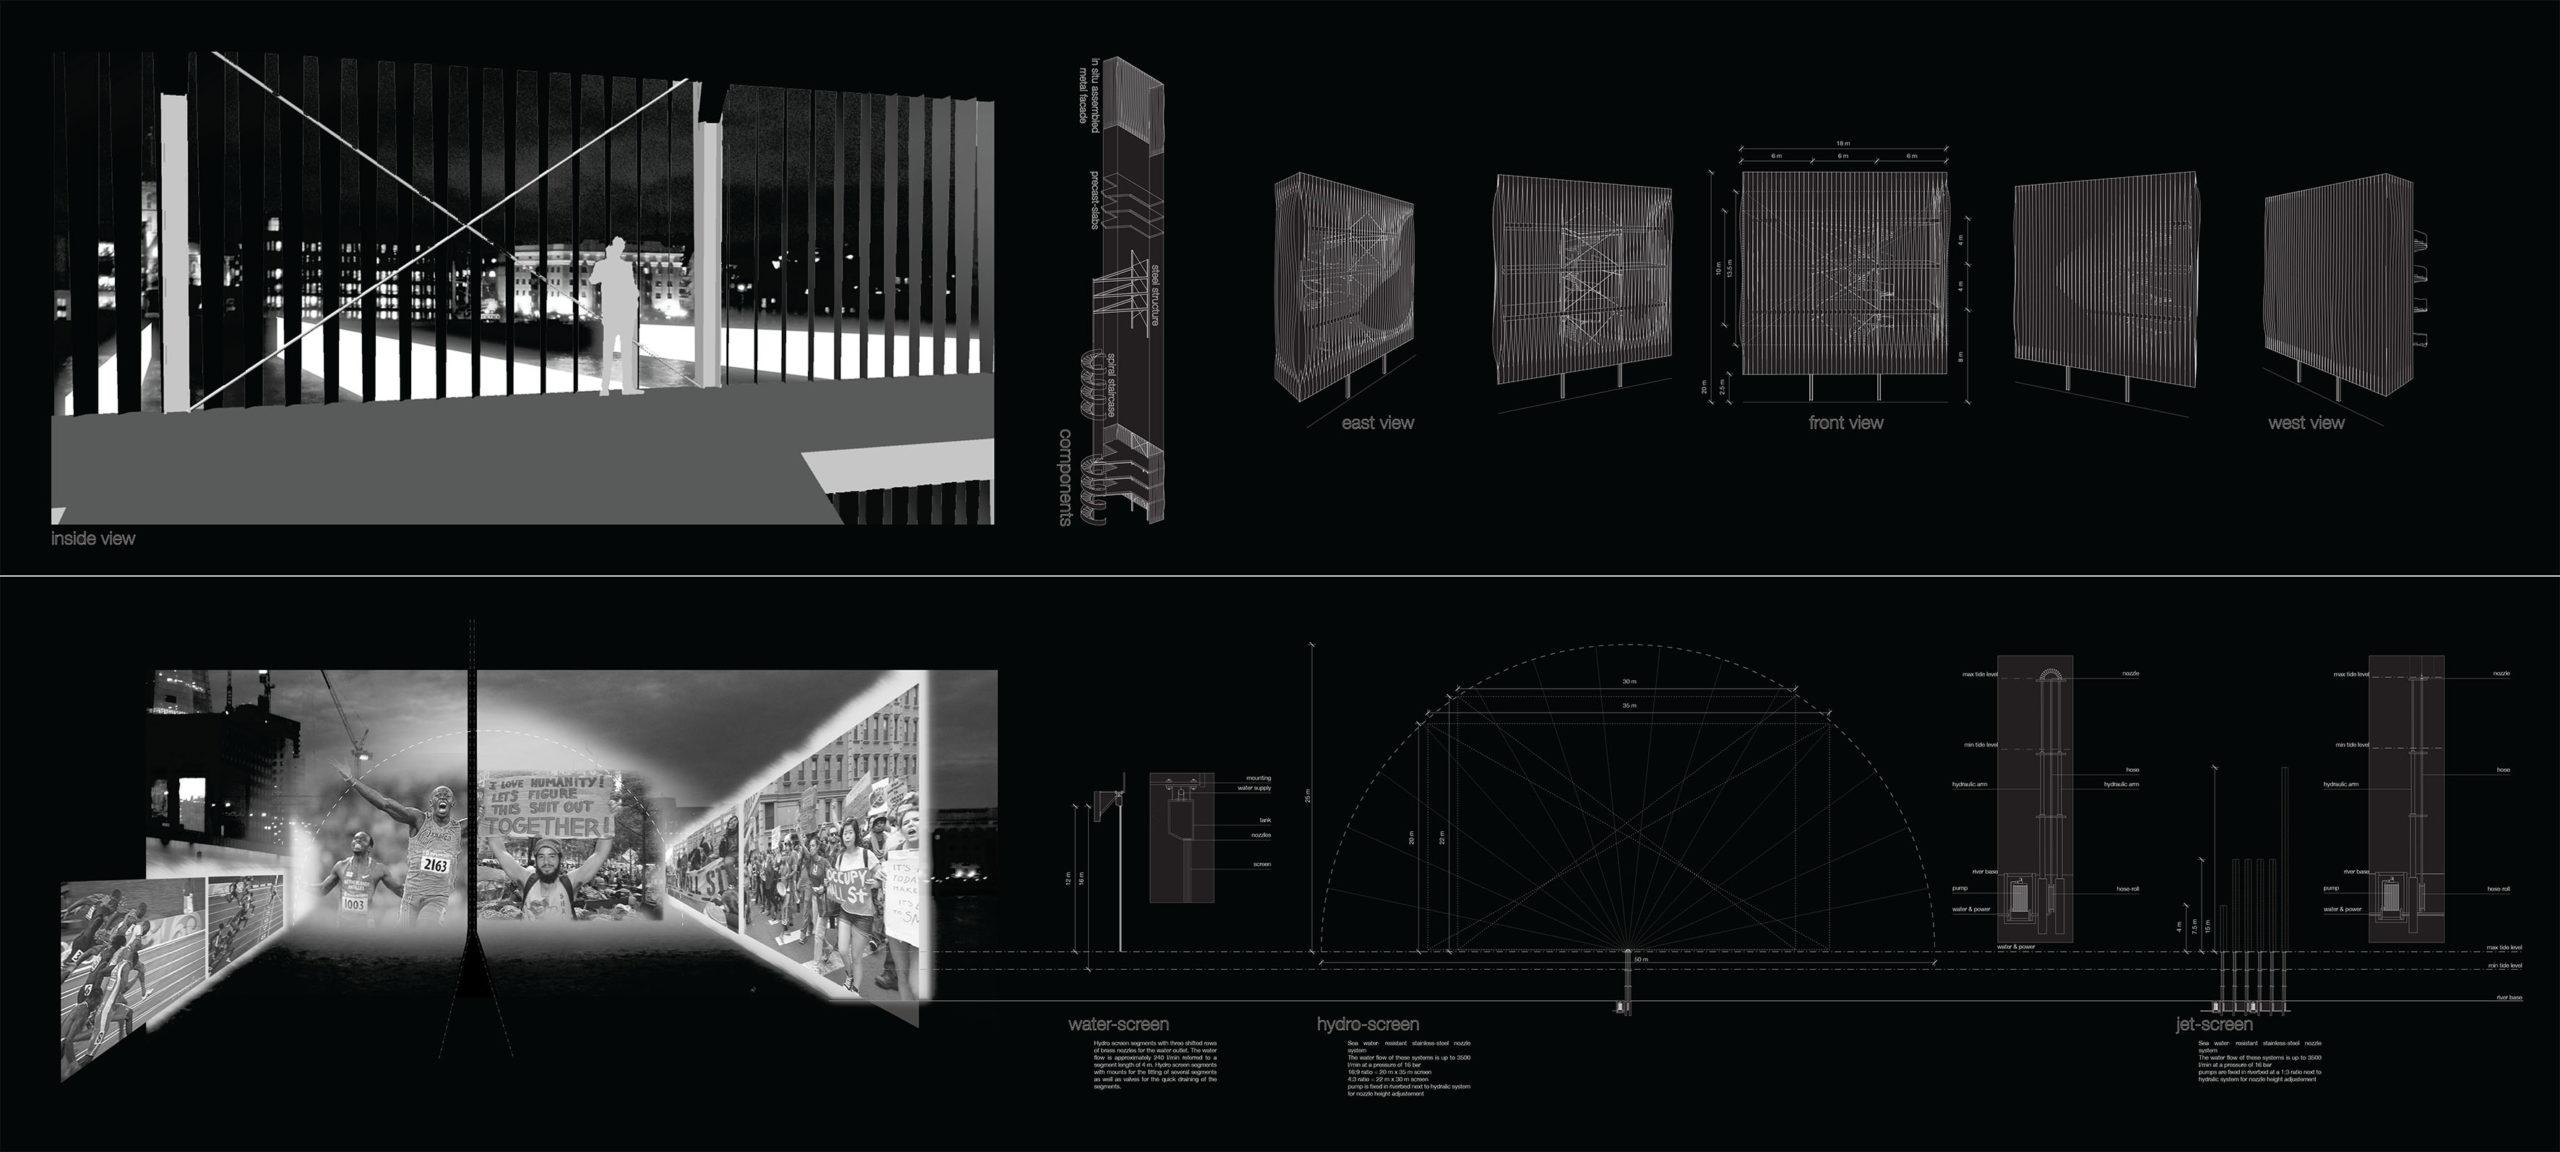 architecture concepts and representation